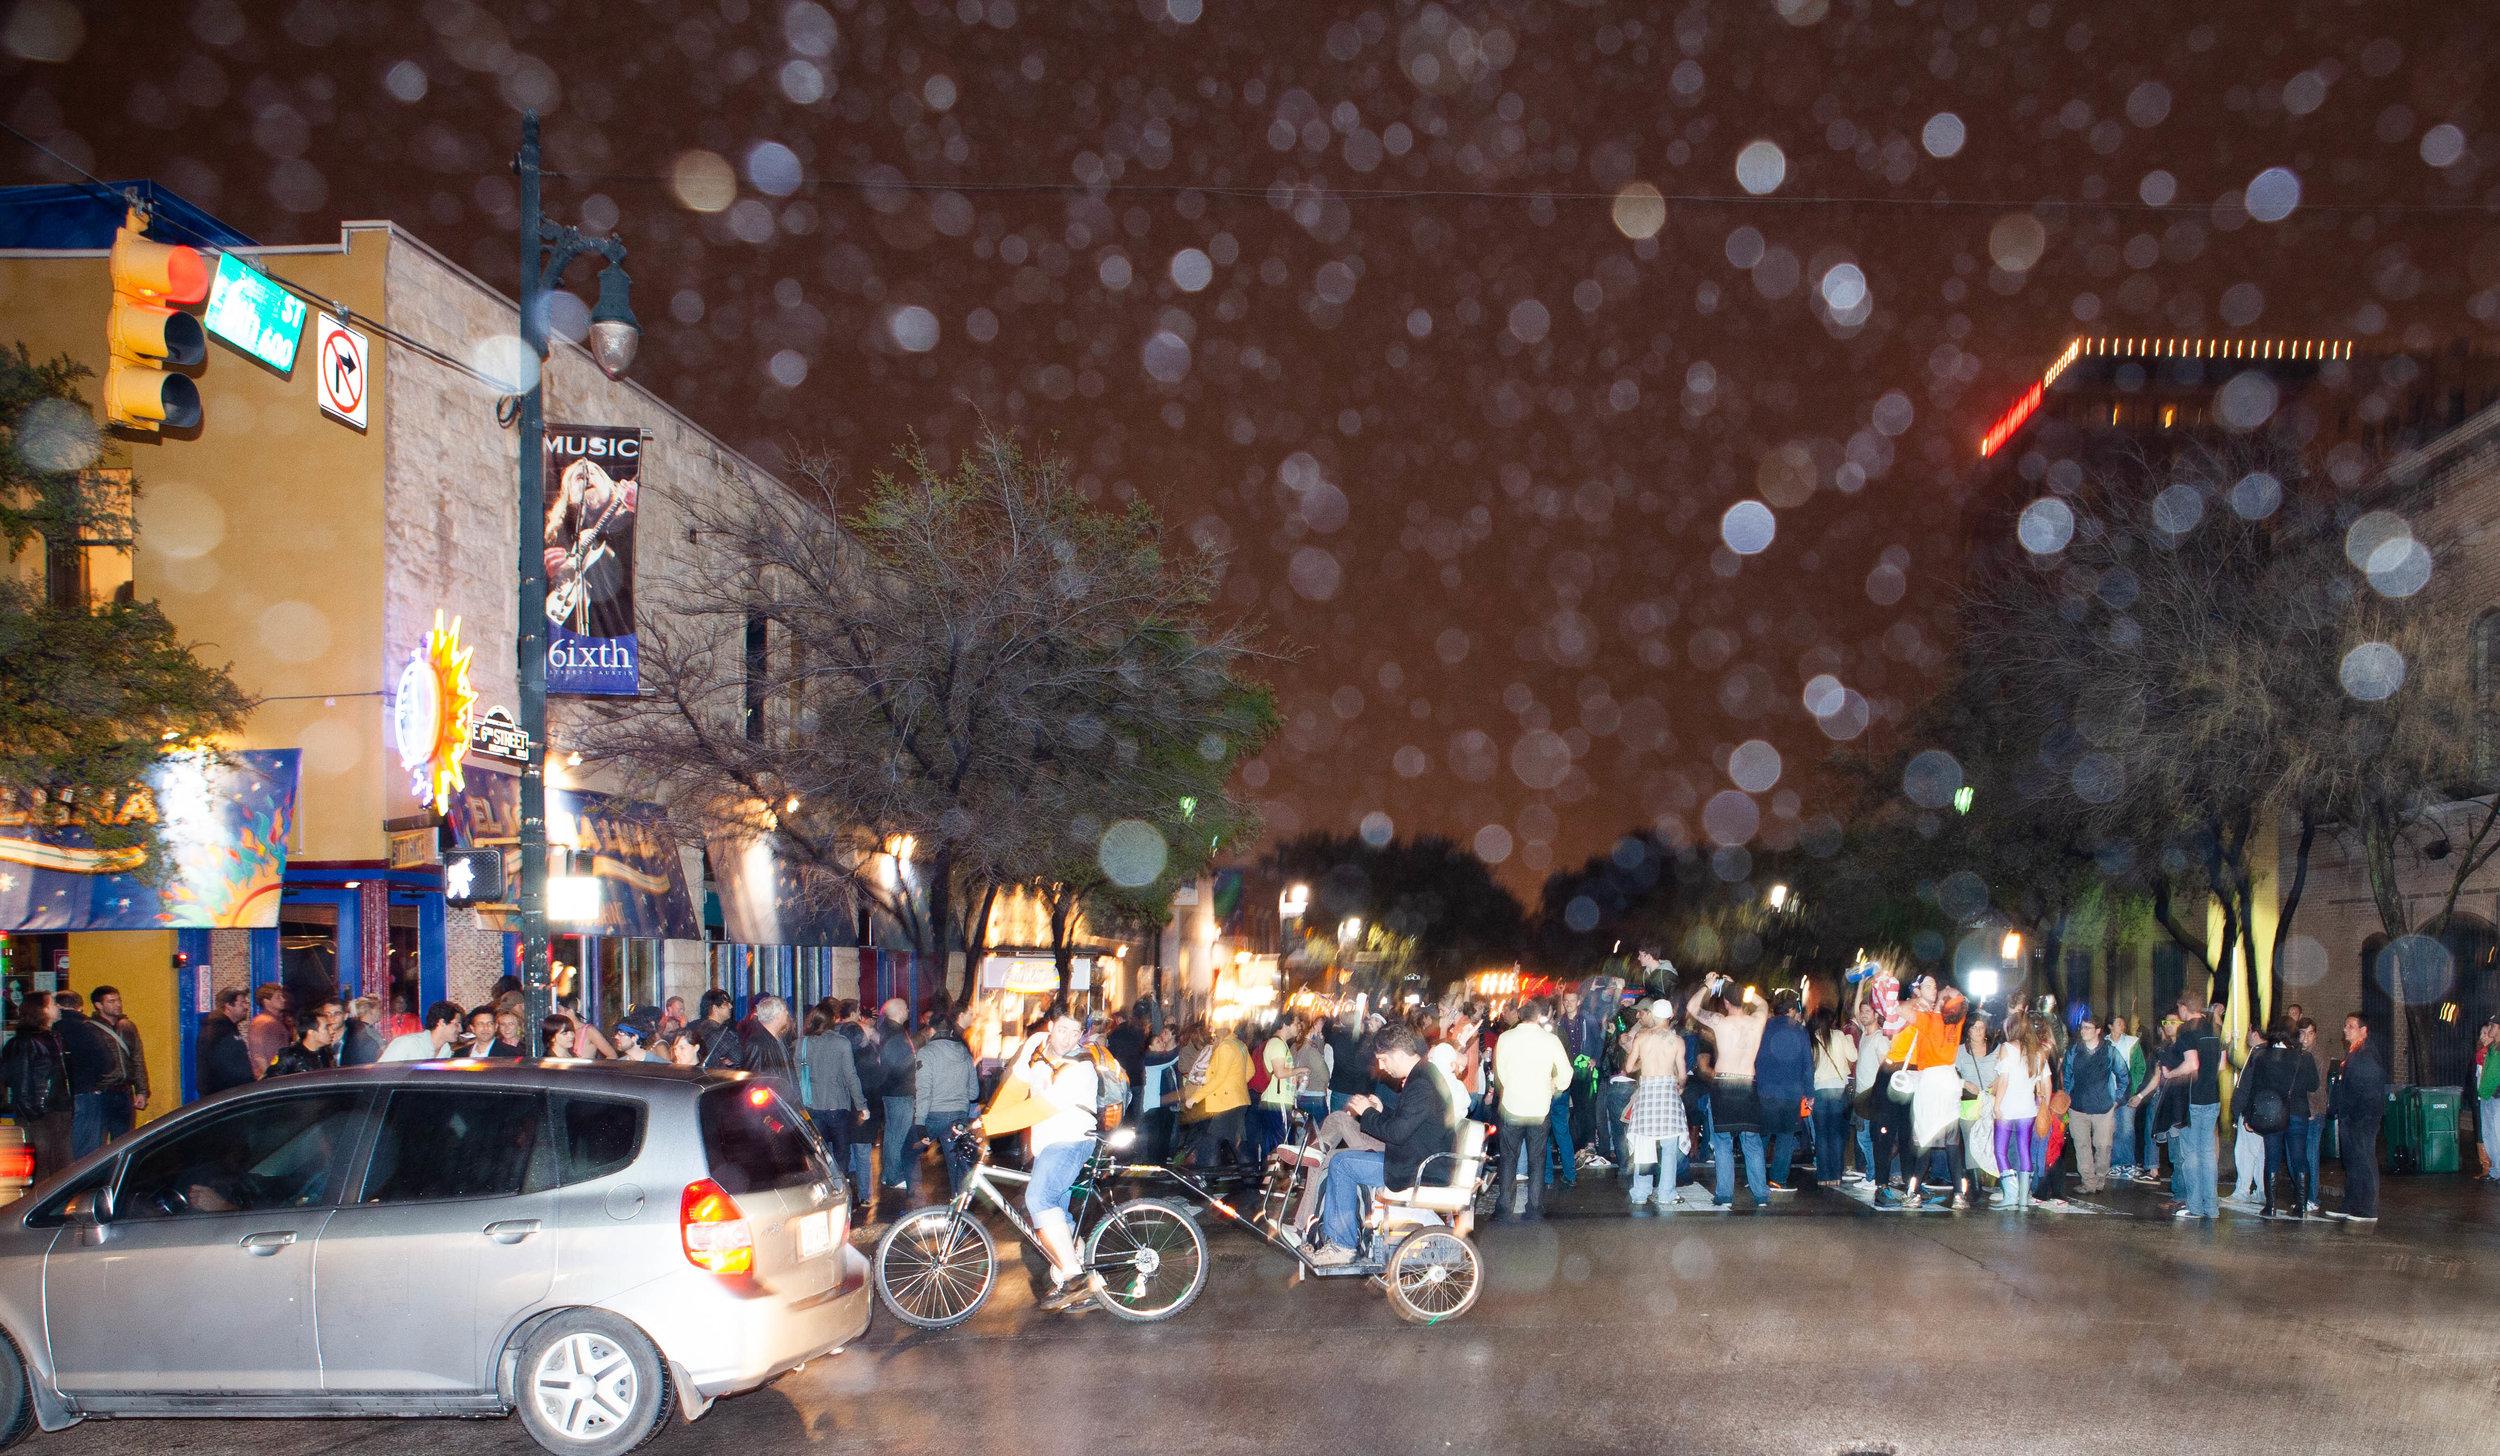 6th street Austin Texas.jpg